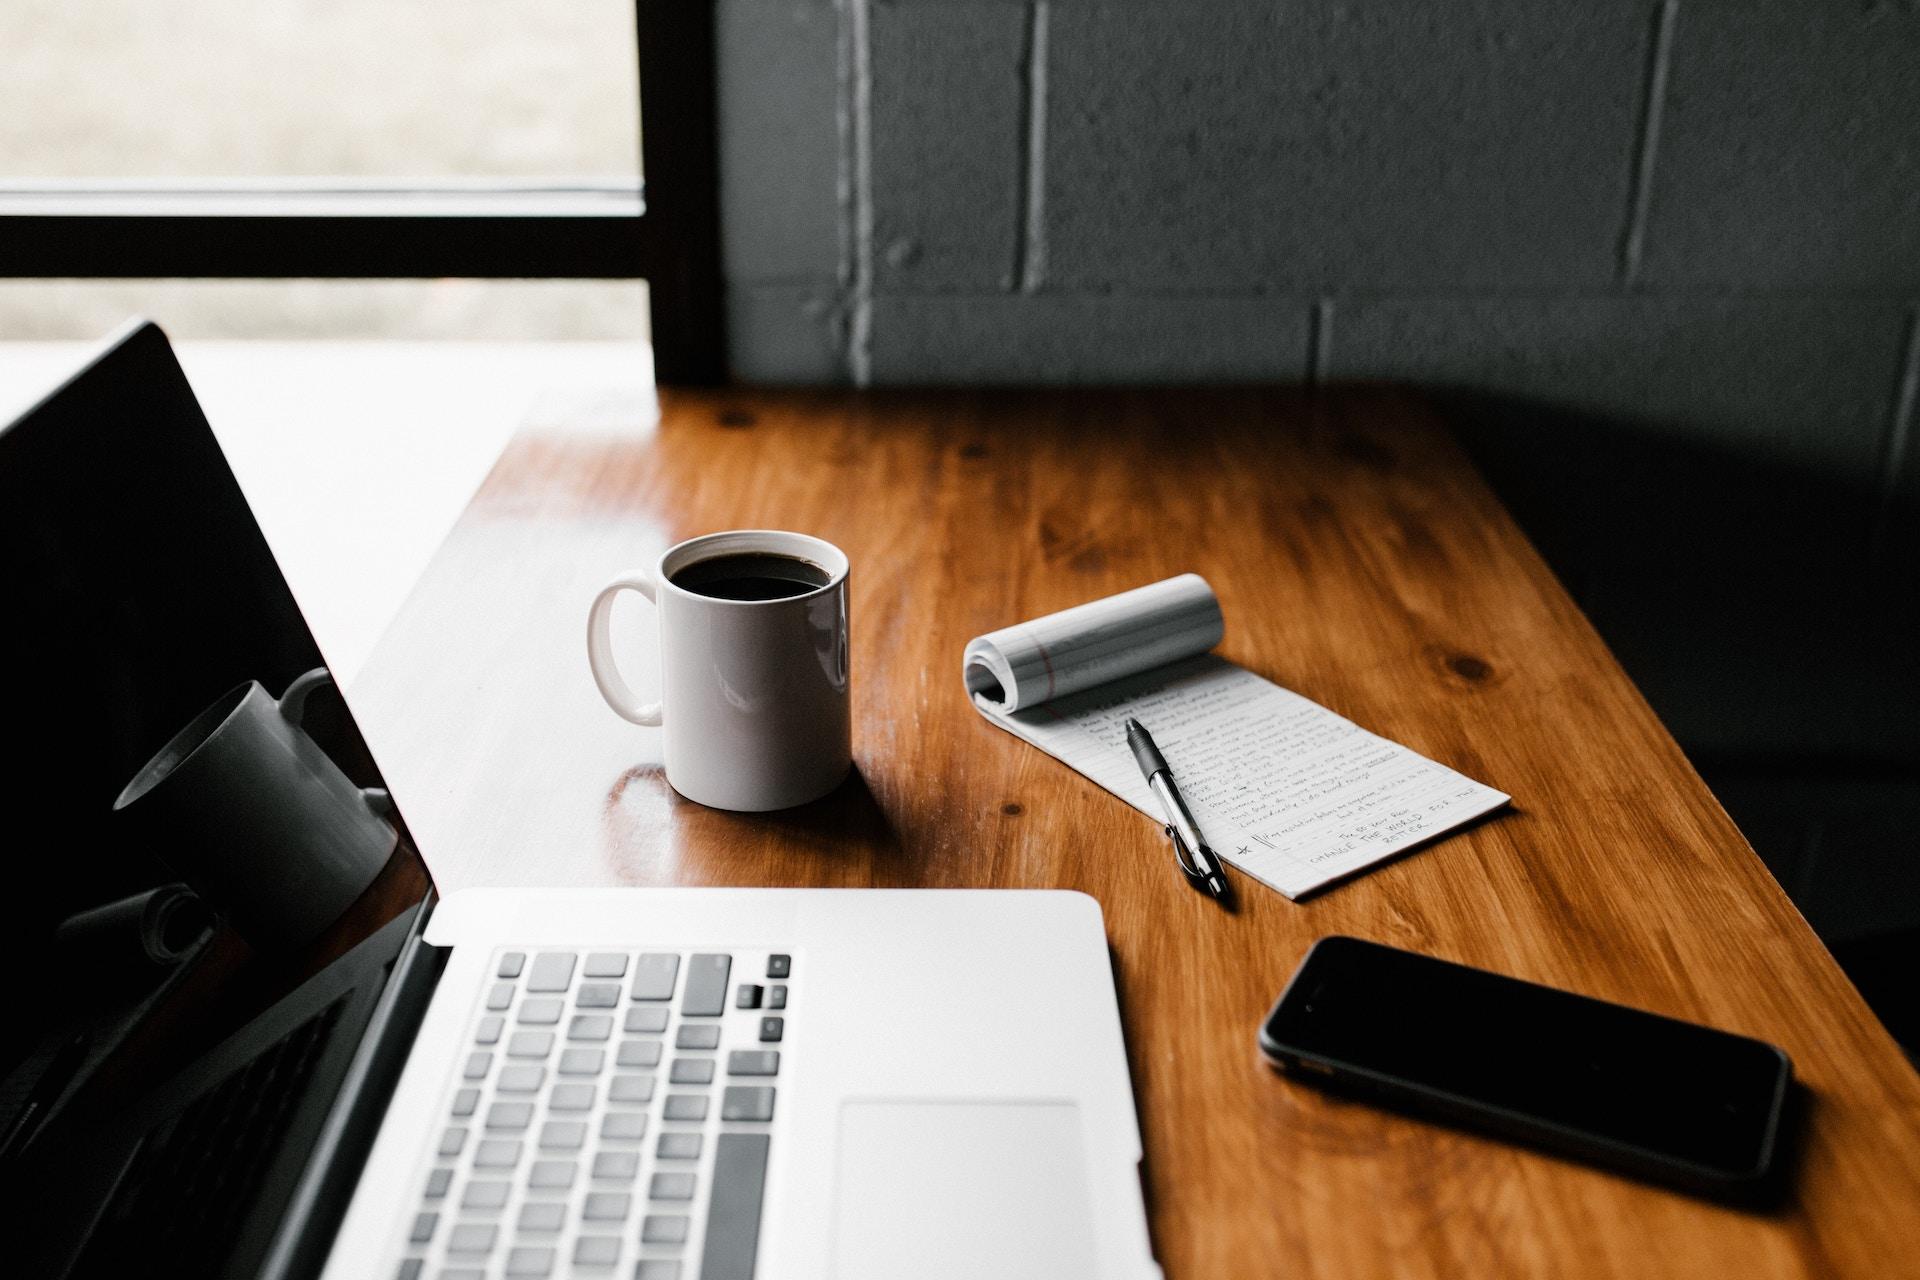 laptop coffee mug working on desk